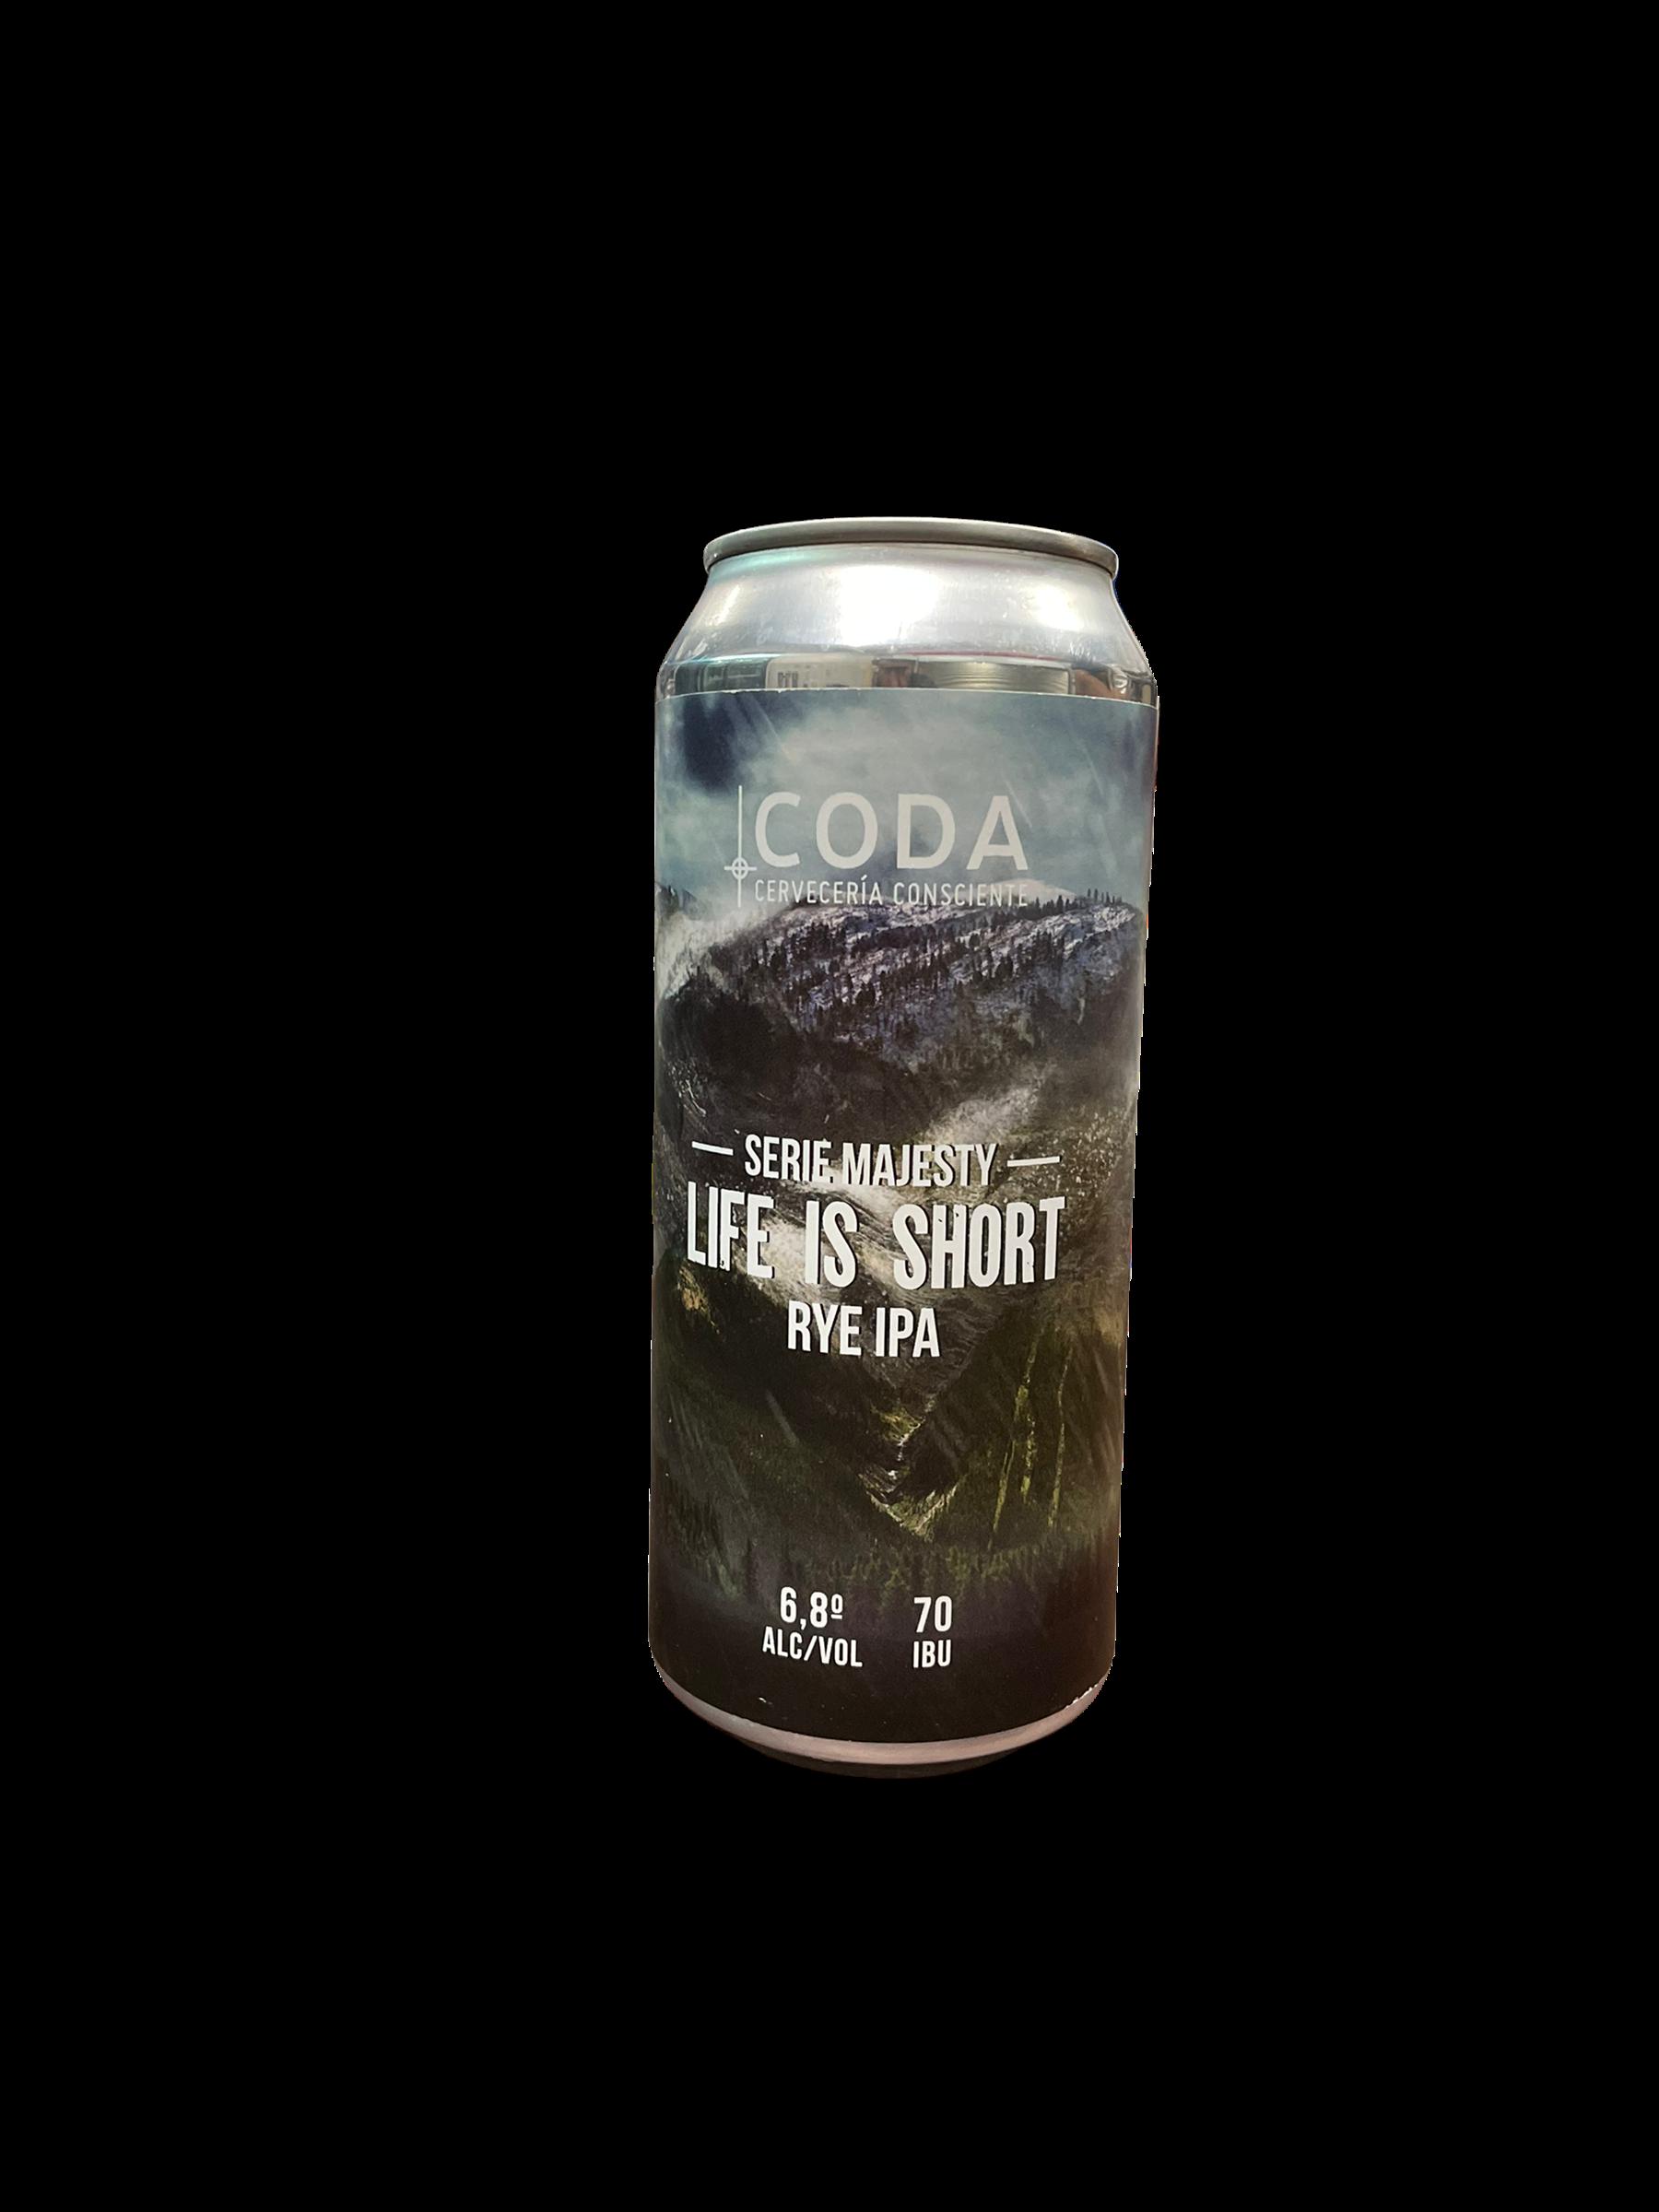 cerveza artesanal Rye IPA de Coda